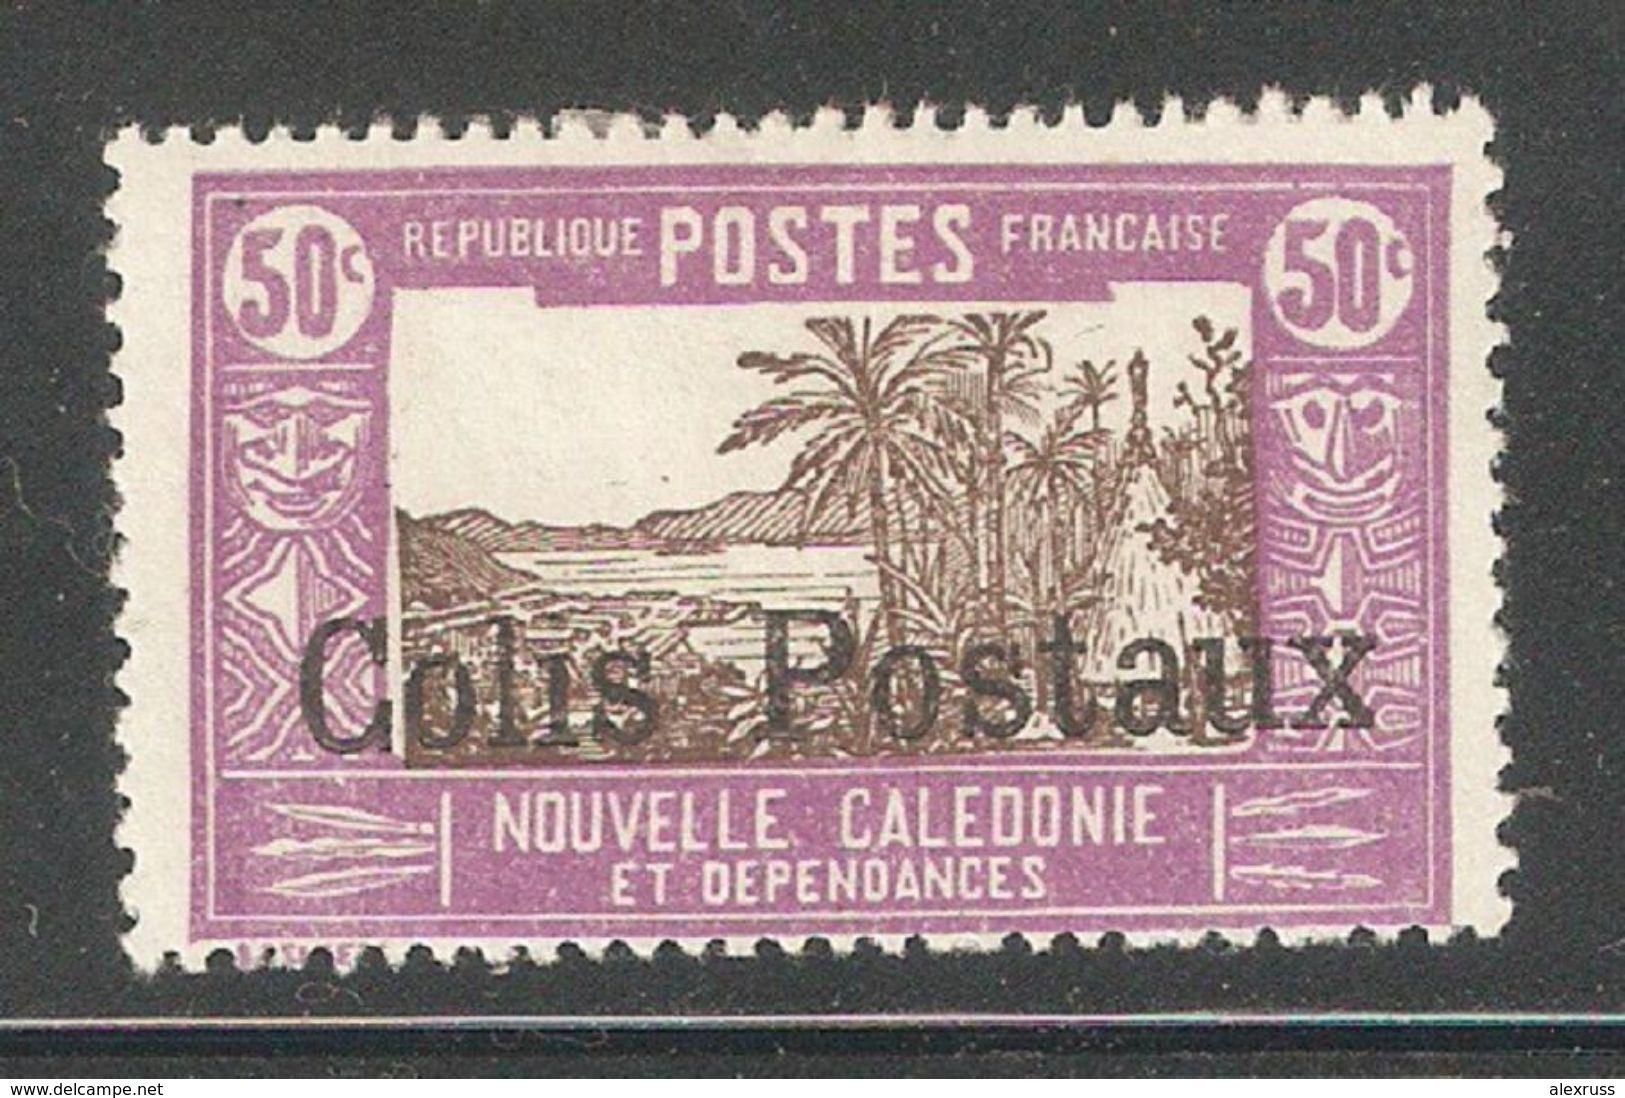 New Caledonia 1930,50c Colis Parcel Post,Sc Q4,VF Mint Hinged* (K-8) - New Caledonia